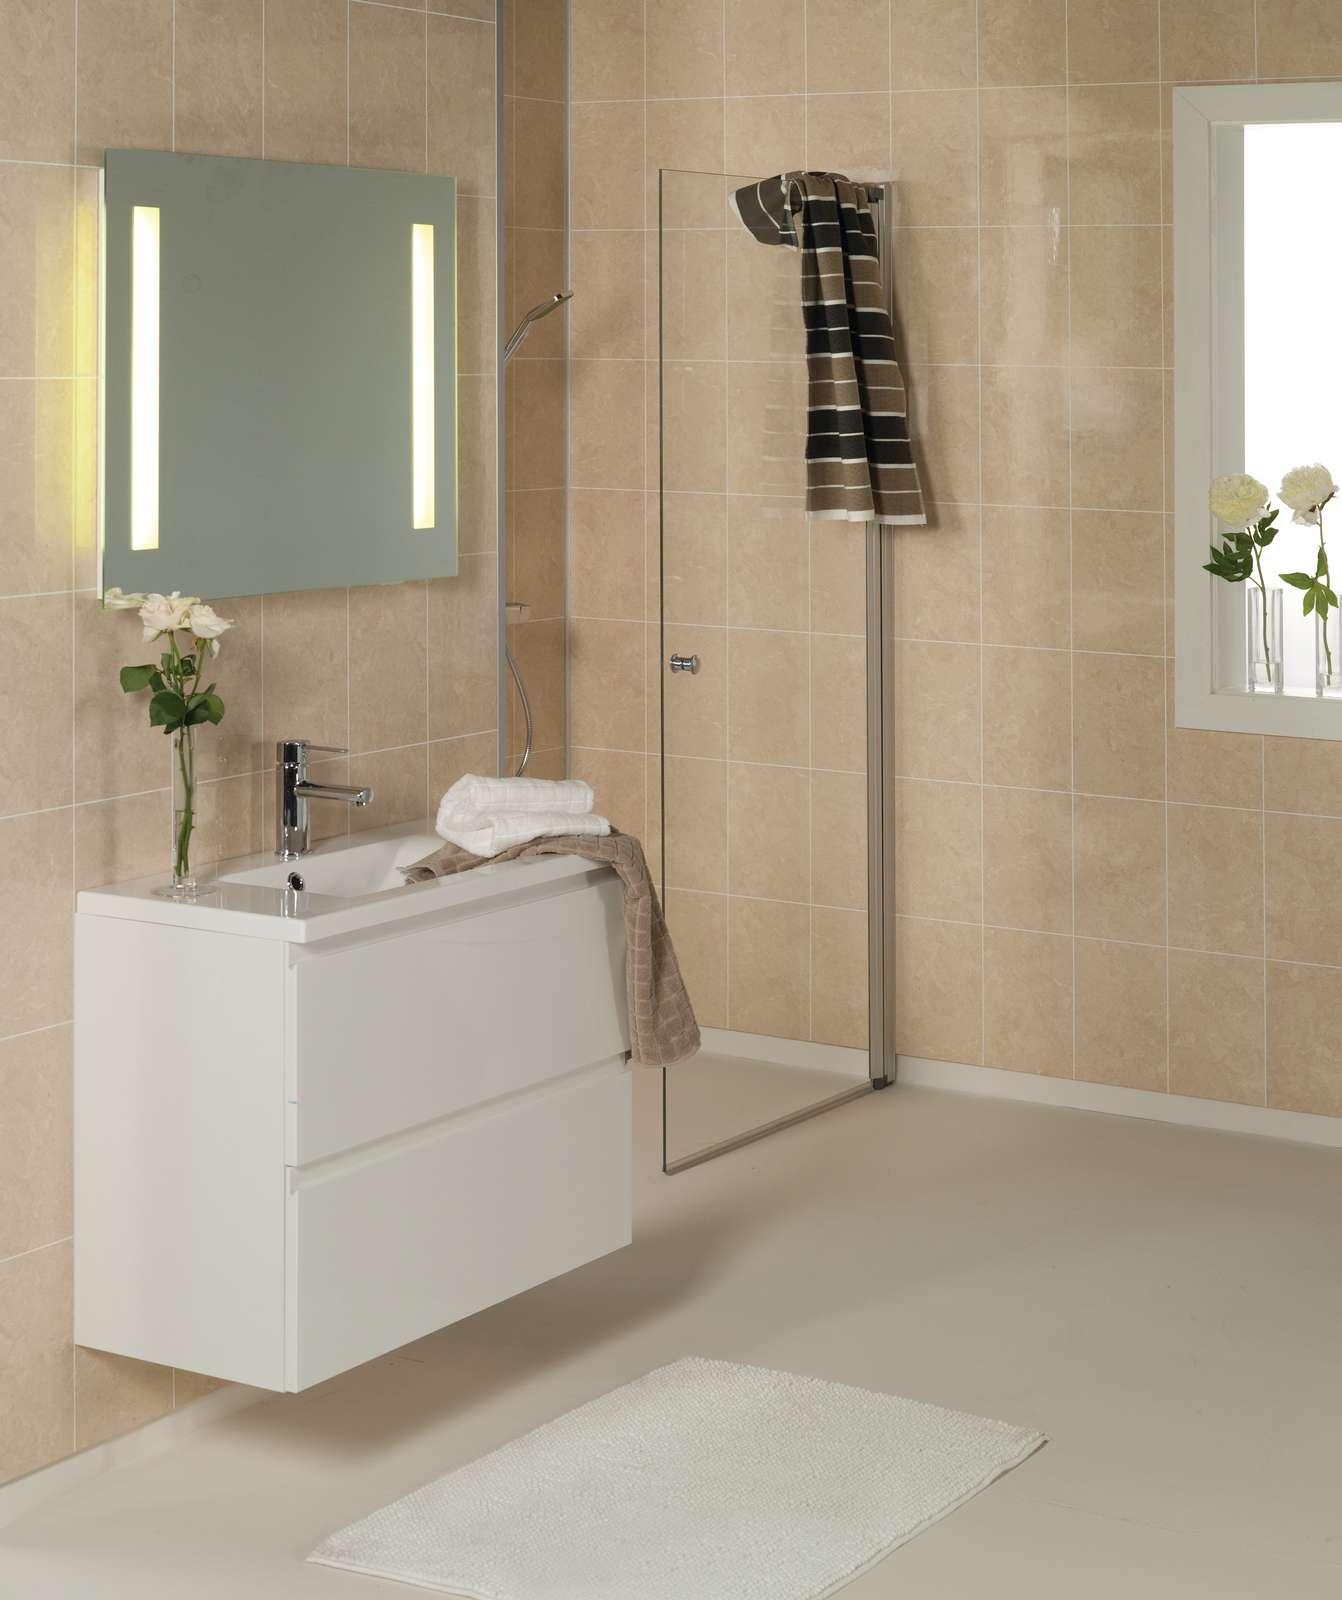 Laminated DIY Bathroom, Shower & Tub Wall Panels & Kits ...